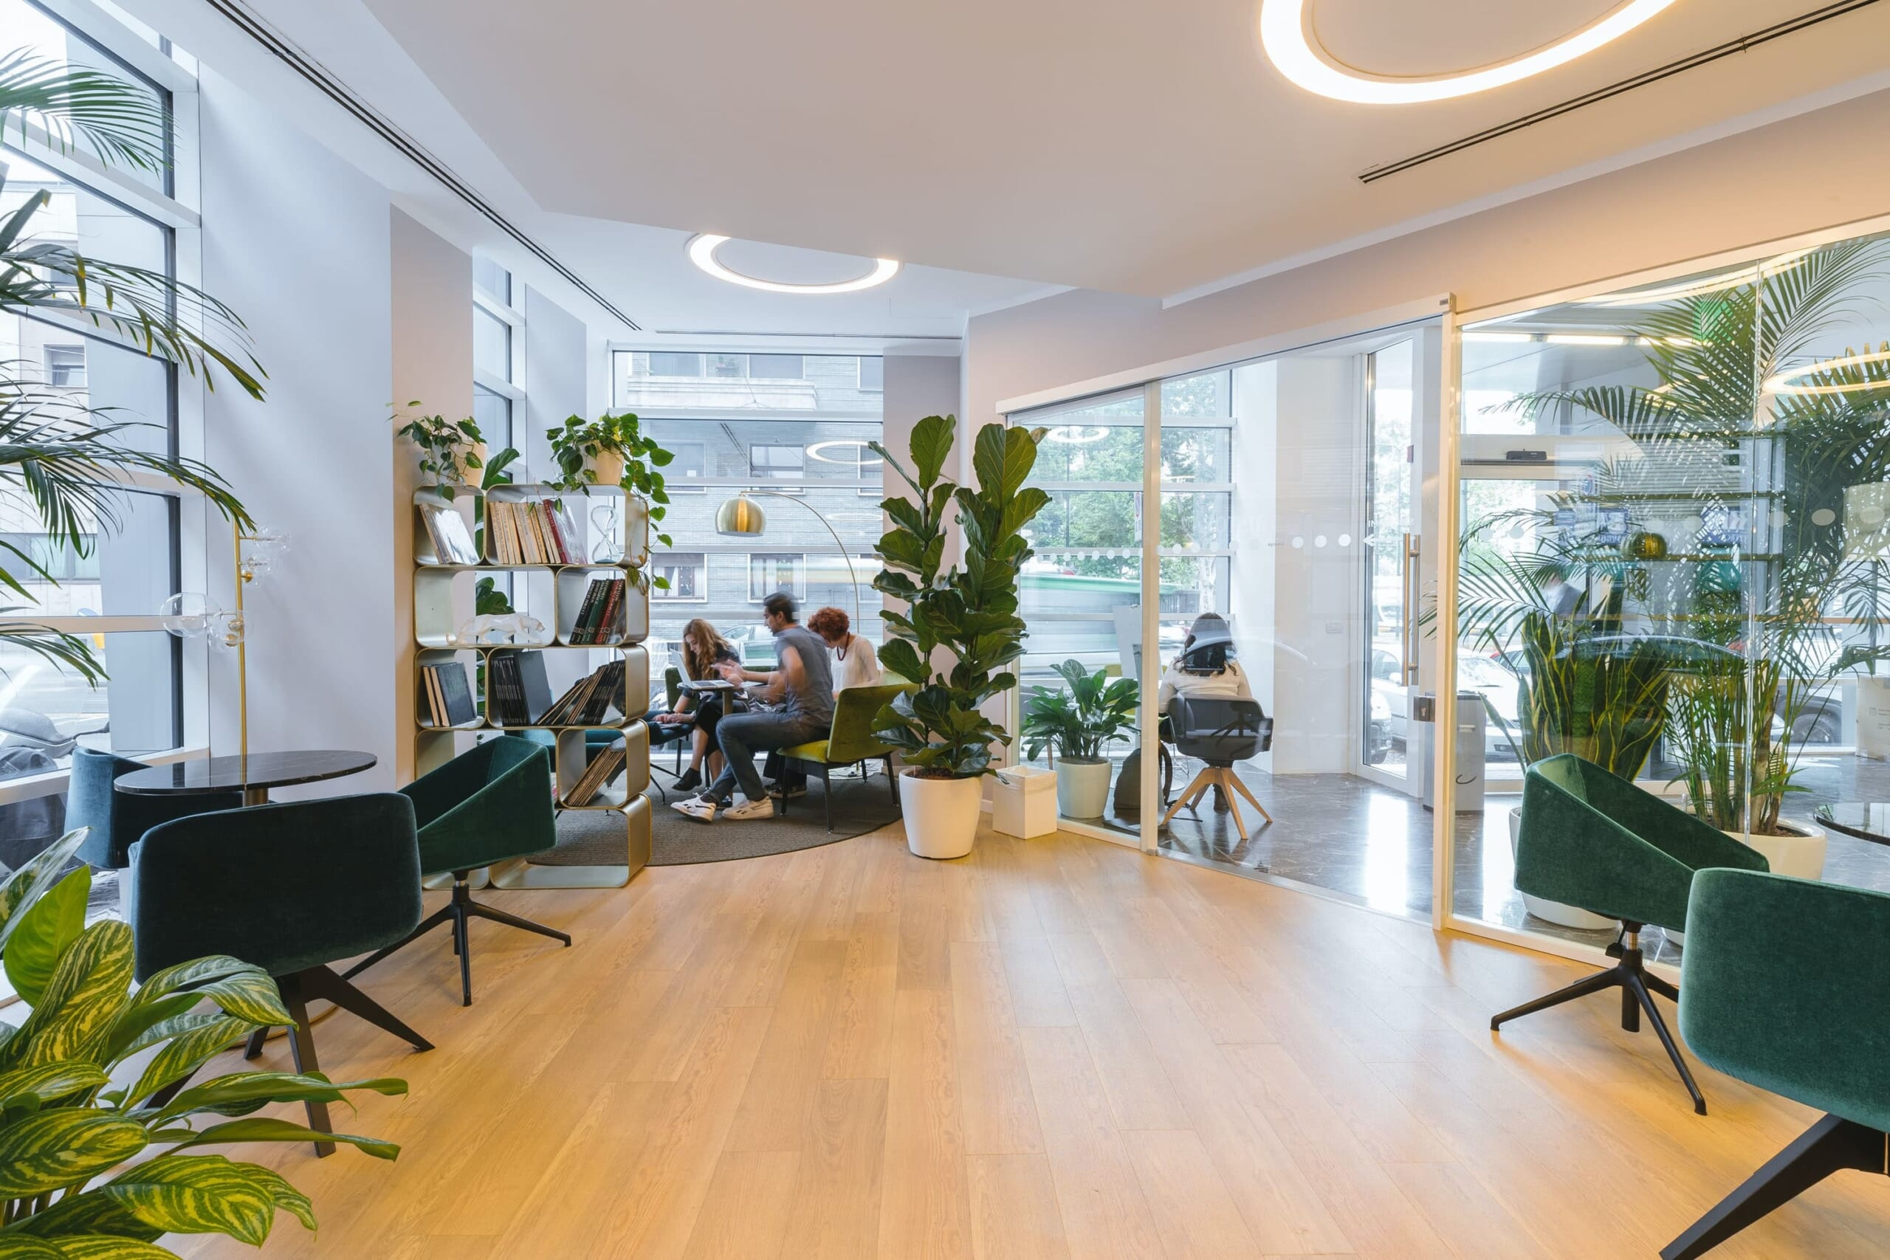 Commercial Interior Design ออกแบบภายในพื้นที่เชิงพานิชย์